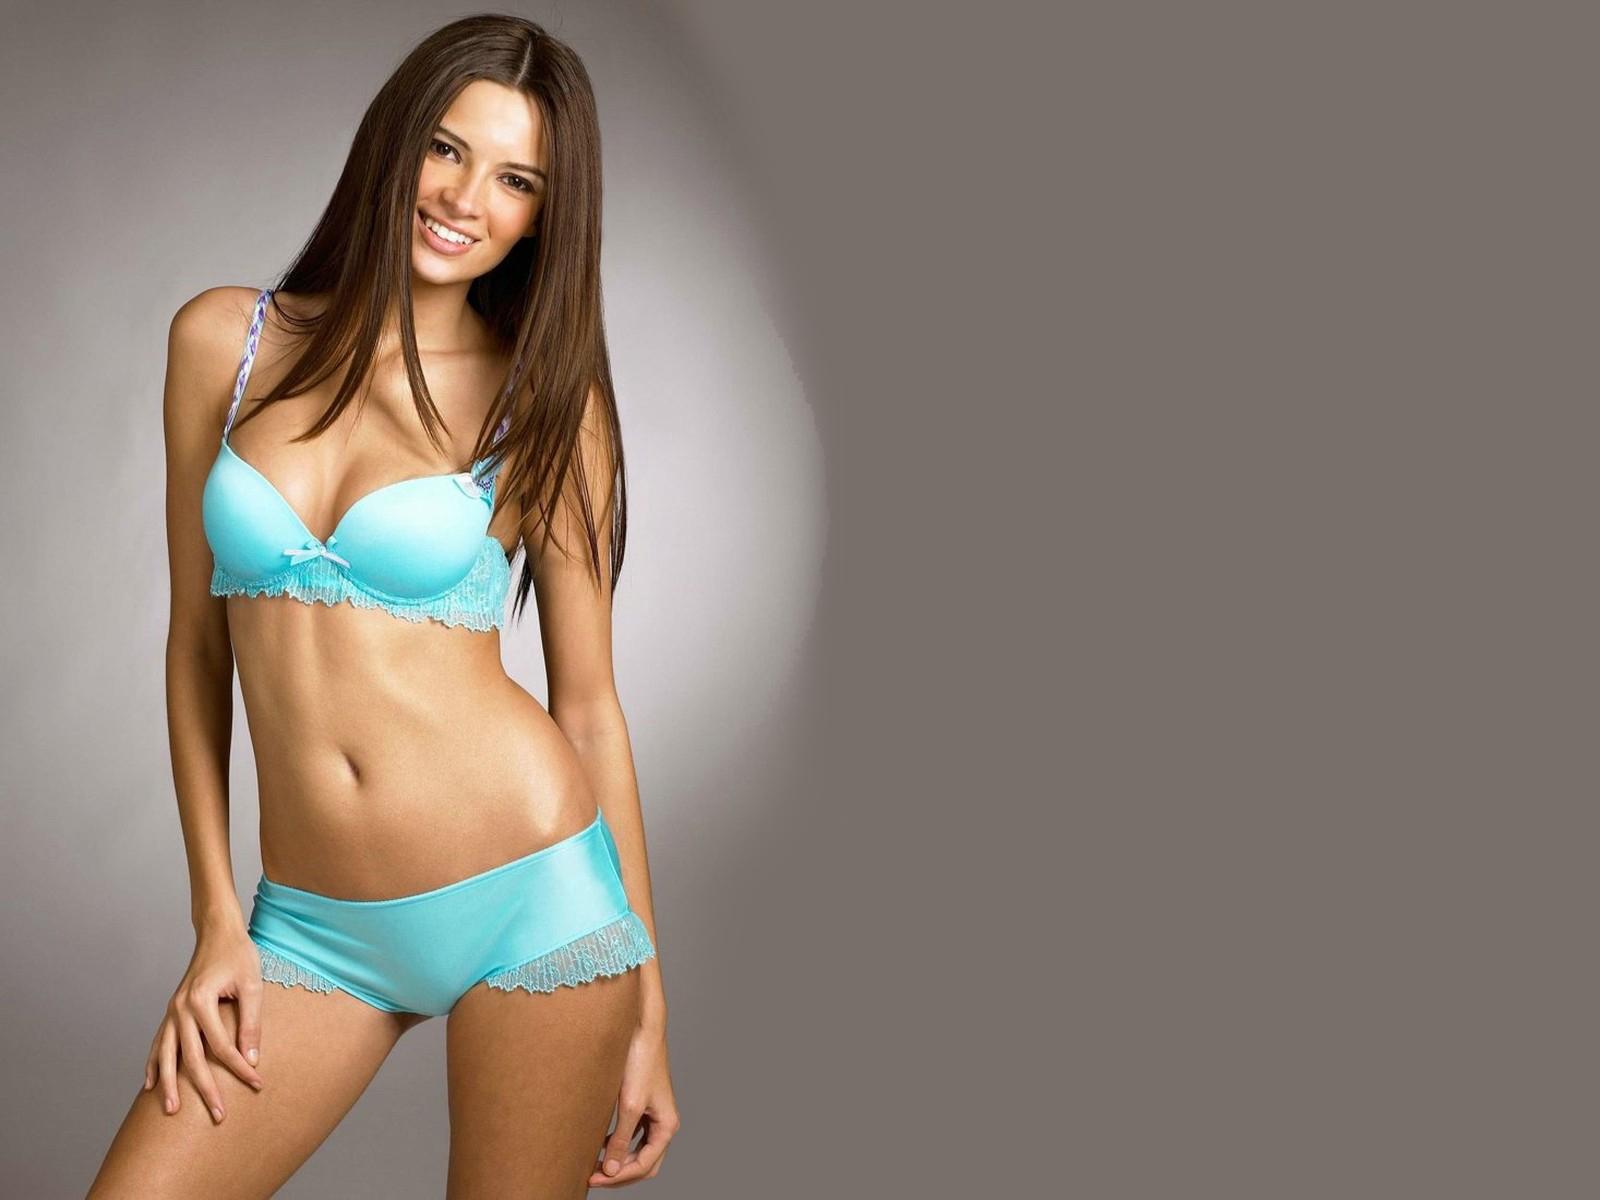 high resolution lewd bikinis